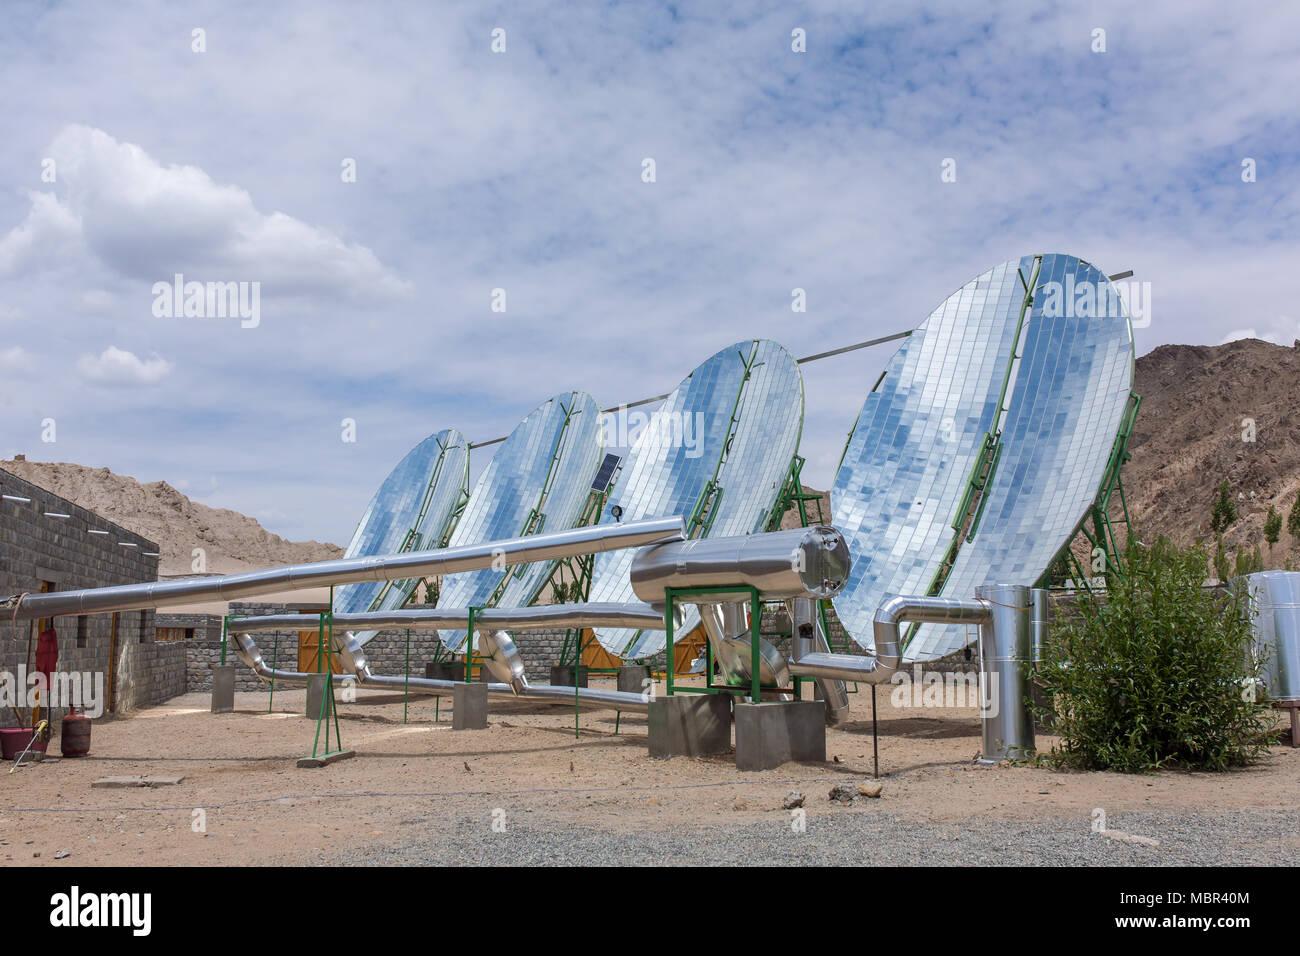 Big Solar Water Boilers in modern experimental school in Leh, Ladakh ...